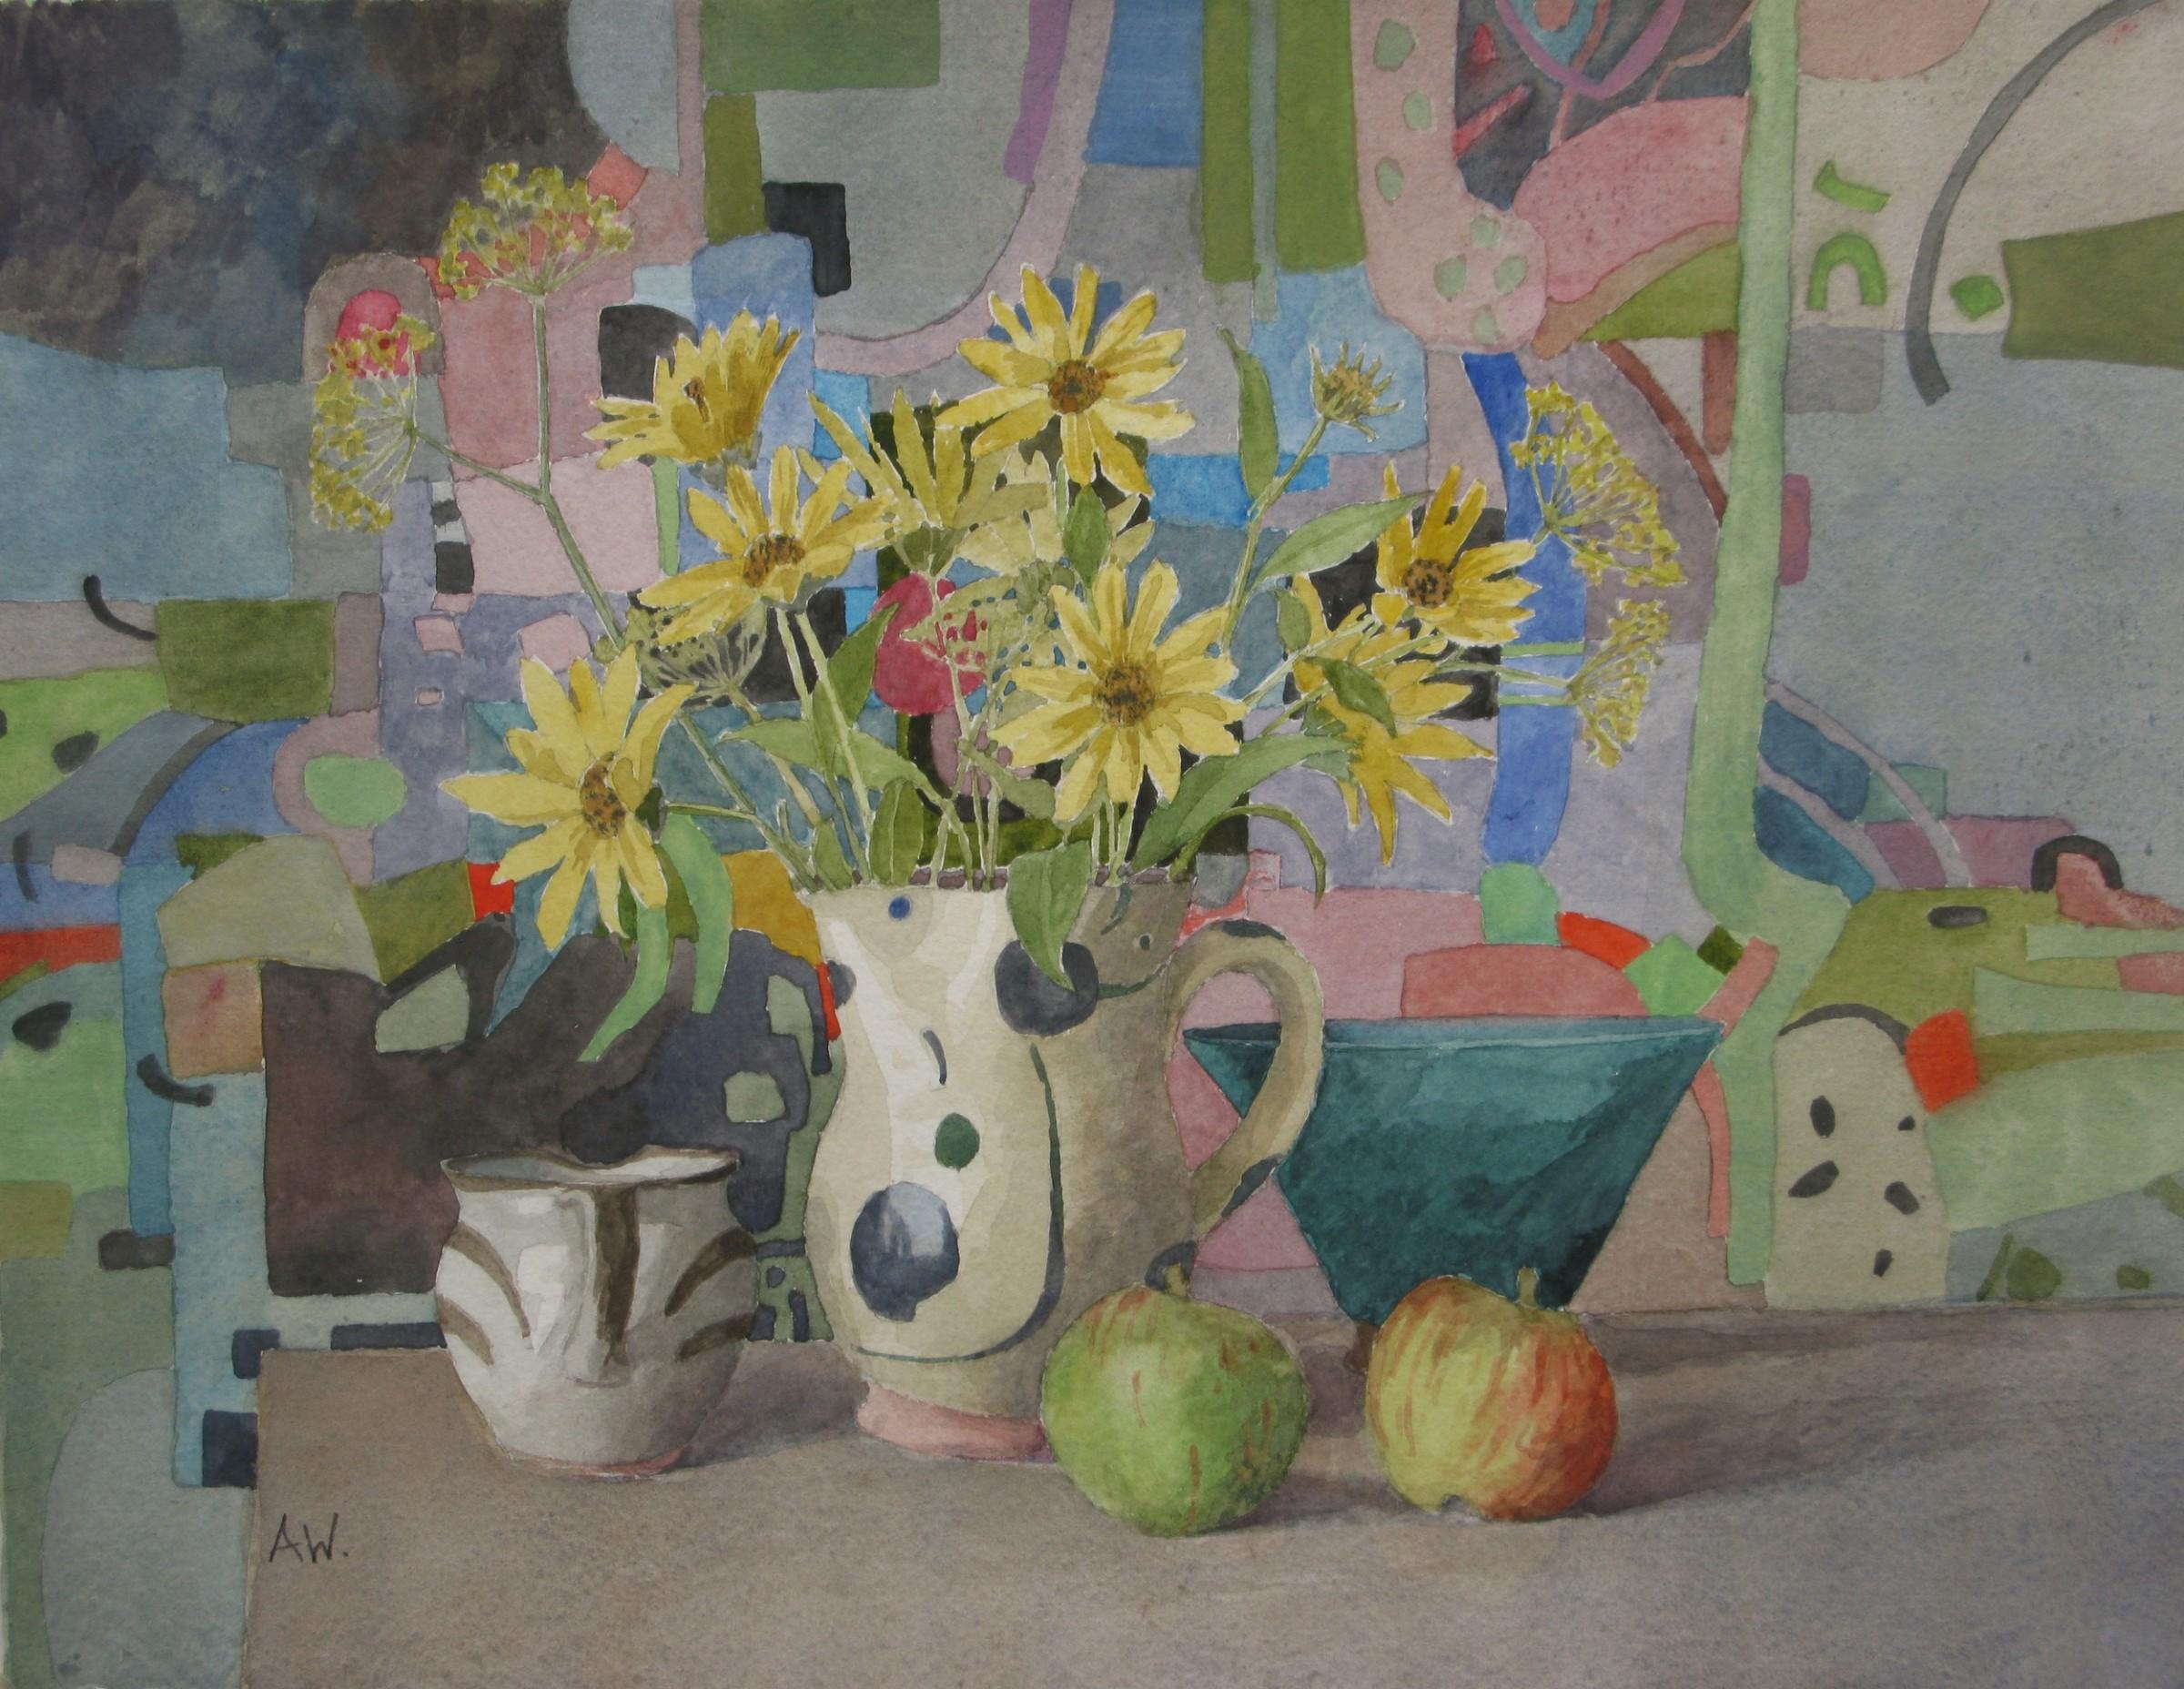 "<span class=""link fancybox-details-link""><a href=""/artists/109-annie-williams/works/12617-annie-williams-prairie-sunflowers/"">View Detail Page</a></span><div class=""artist""><span class=""artist""><strong>Annie Williams</strong></span></div><div class=""title""><em>Prairie Sunflowers</em></div><div class=""medium"">watercolour</div><div class=""dimensions"">Artwork: 35 x 27cm</div><div class=""price"">£400.00</div>"